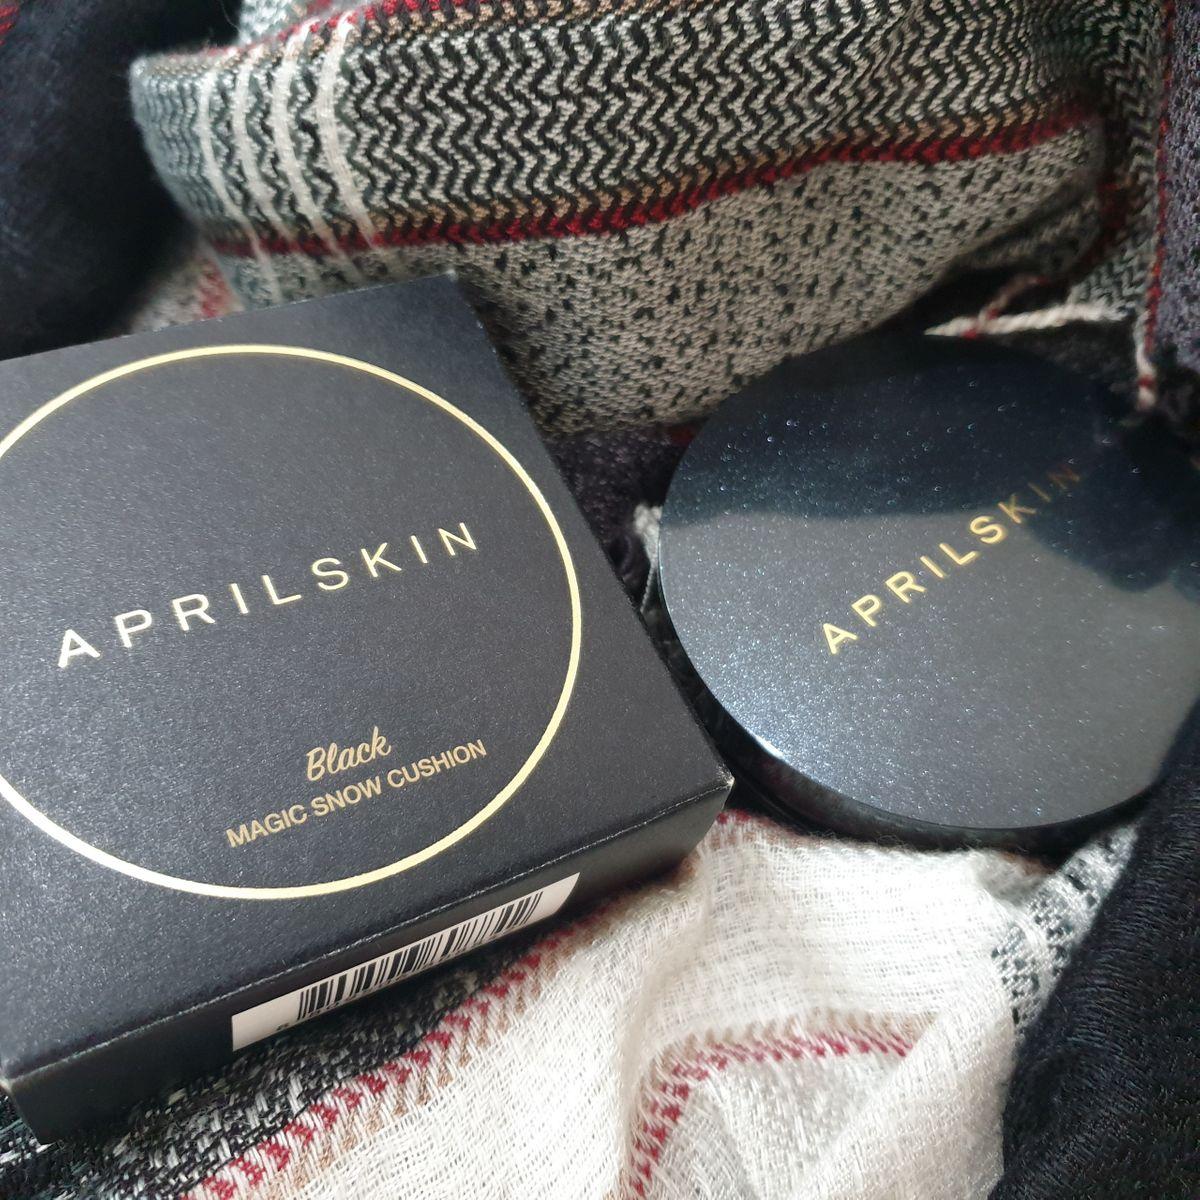 Phấn Nước April Skin Black Magic Snow Cushion #22 Pink Beige (Galaxy Edition)